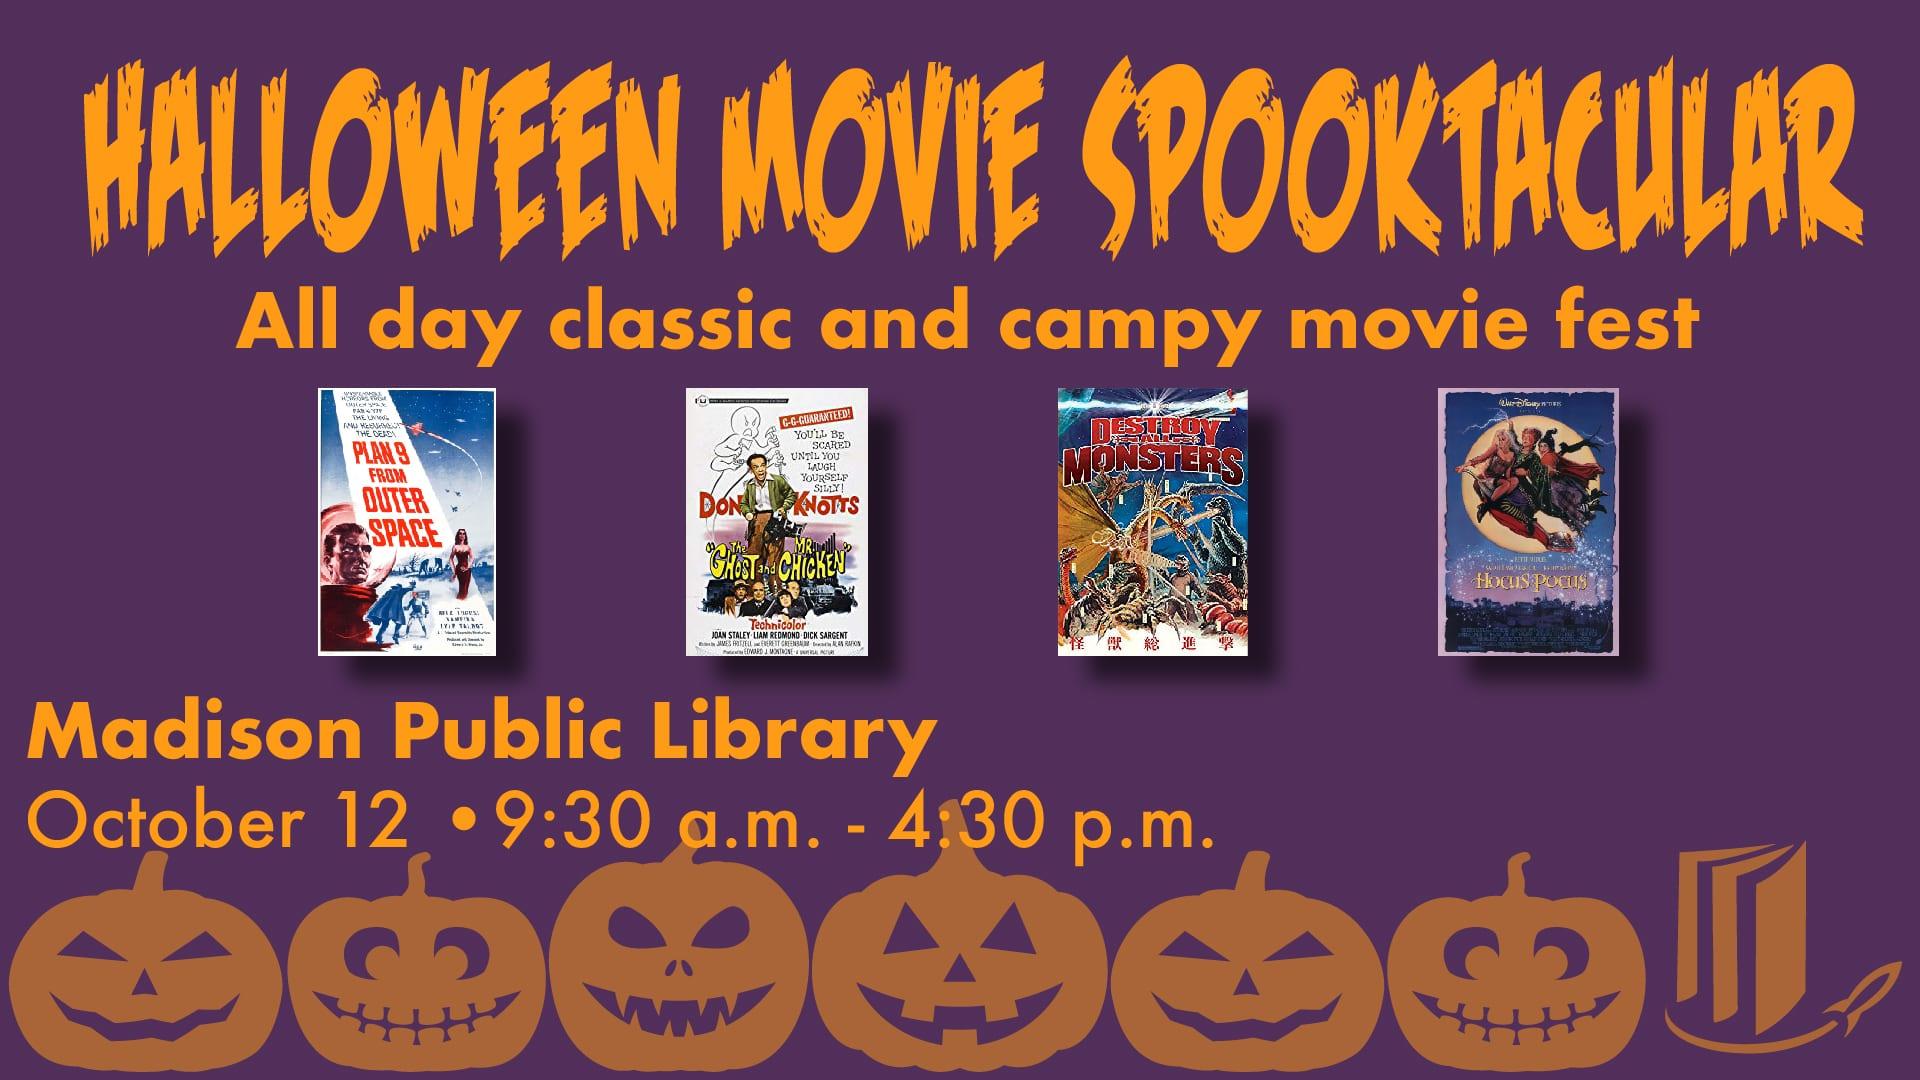 Halloween Movie Spooktacular